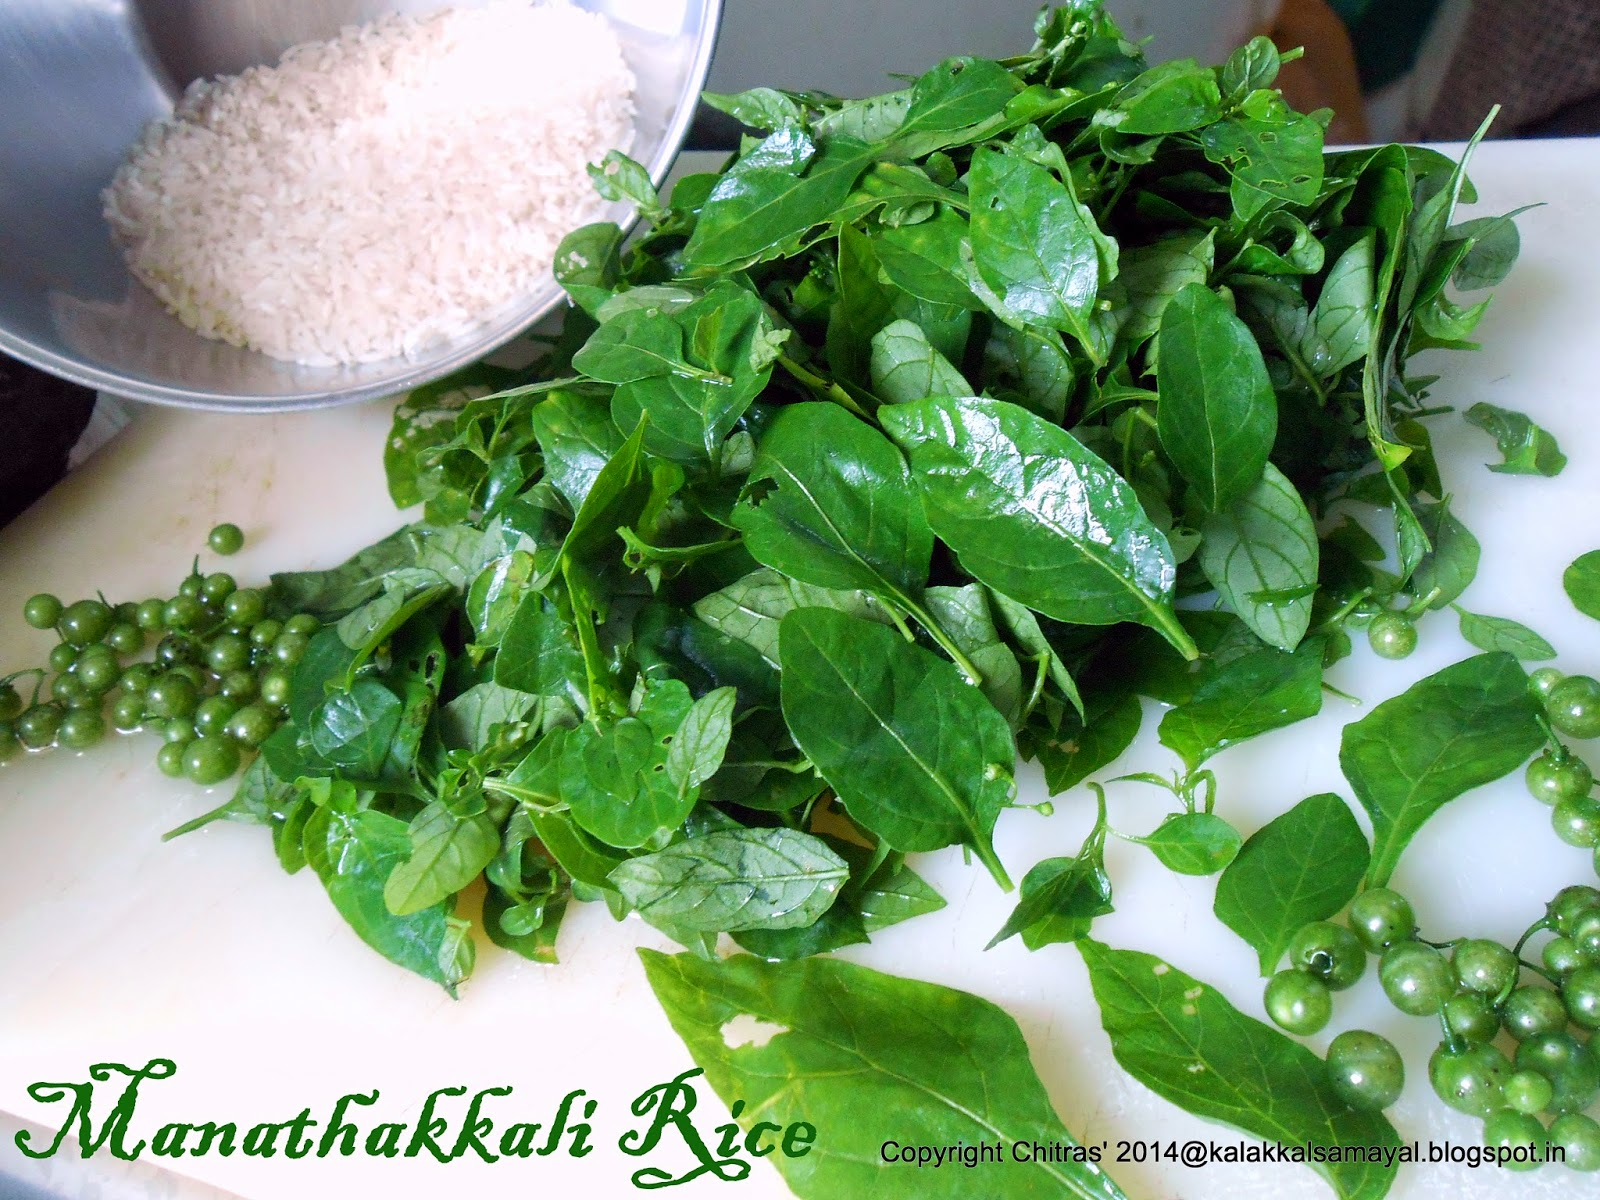 Manathakkali keerai Rice